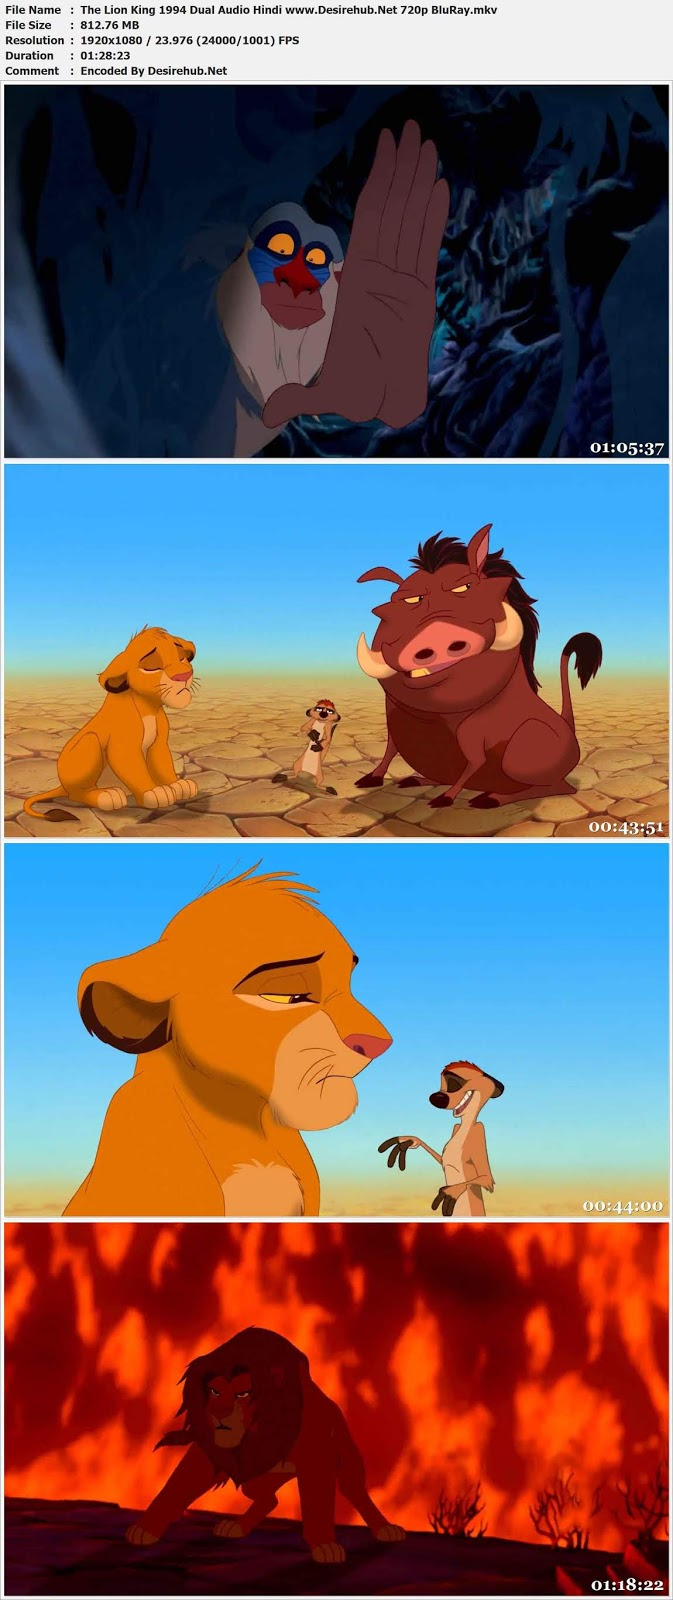 The Lion King 1994 Dual Audio Hindi 720p BluRay 800MB Desirehub